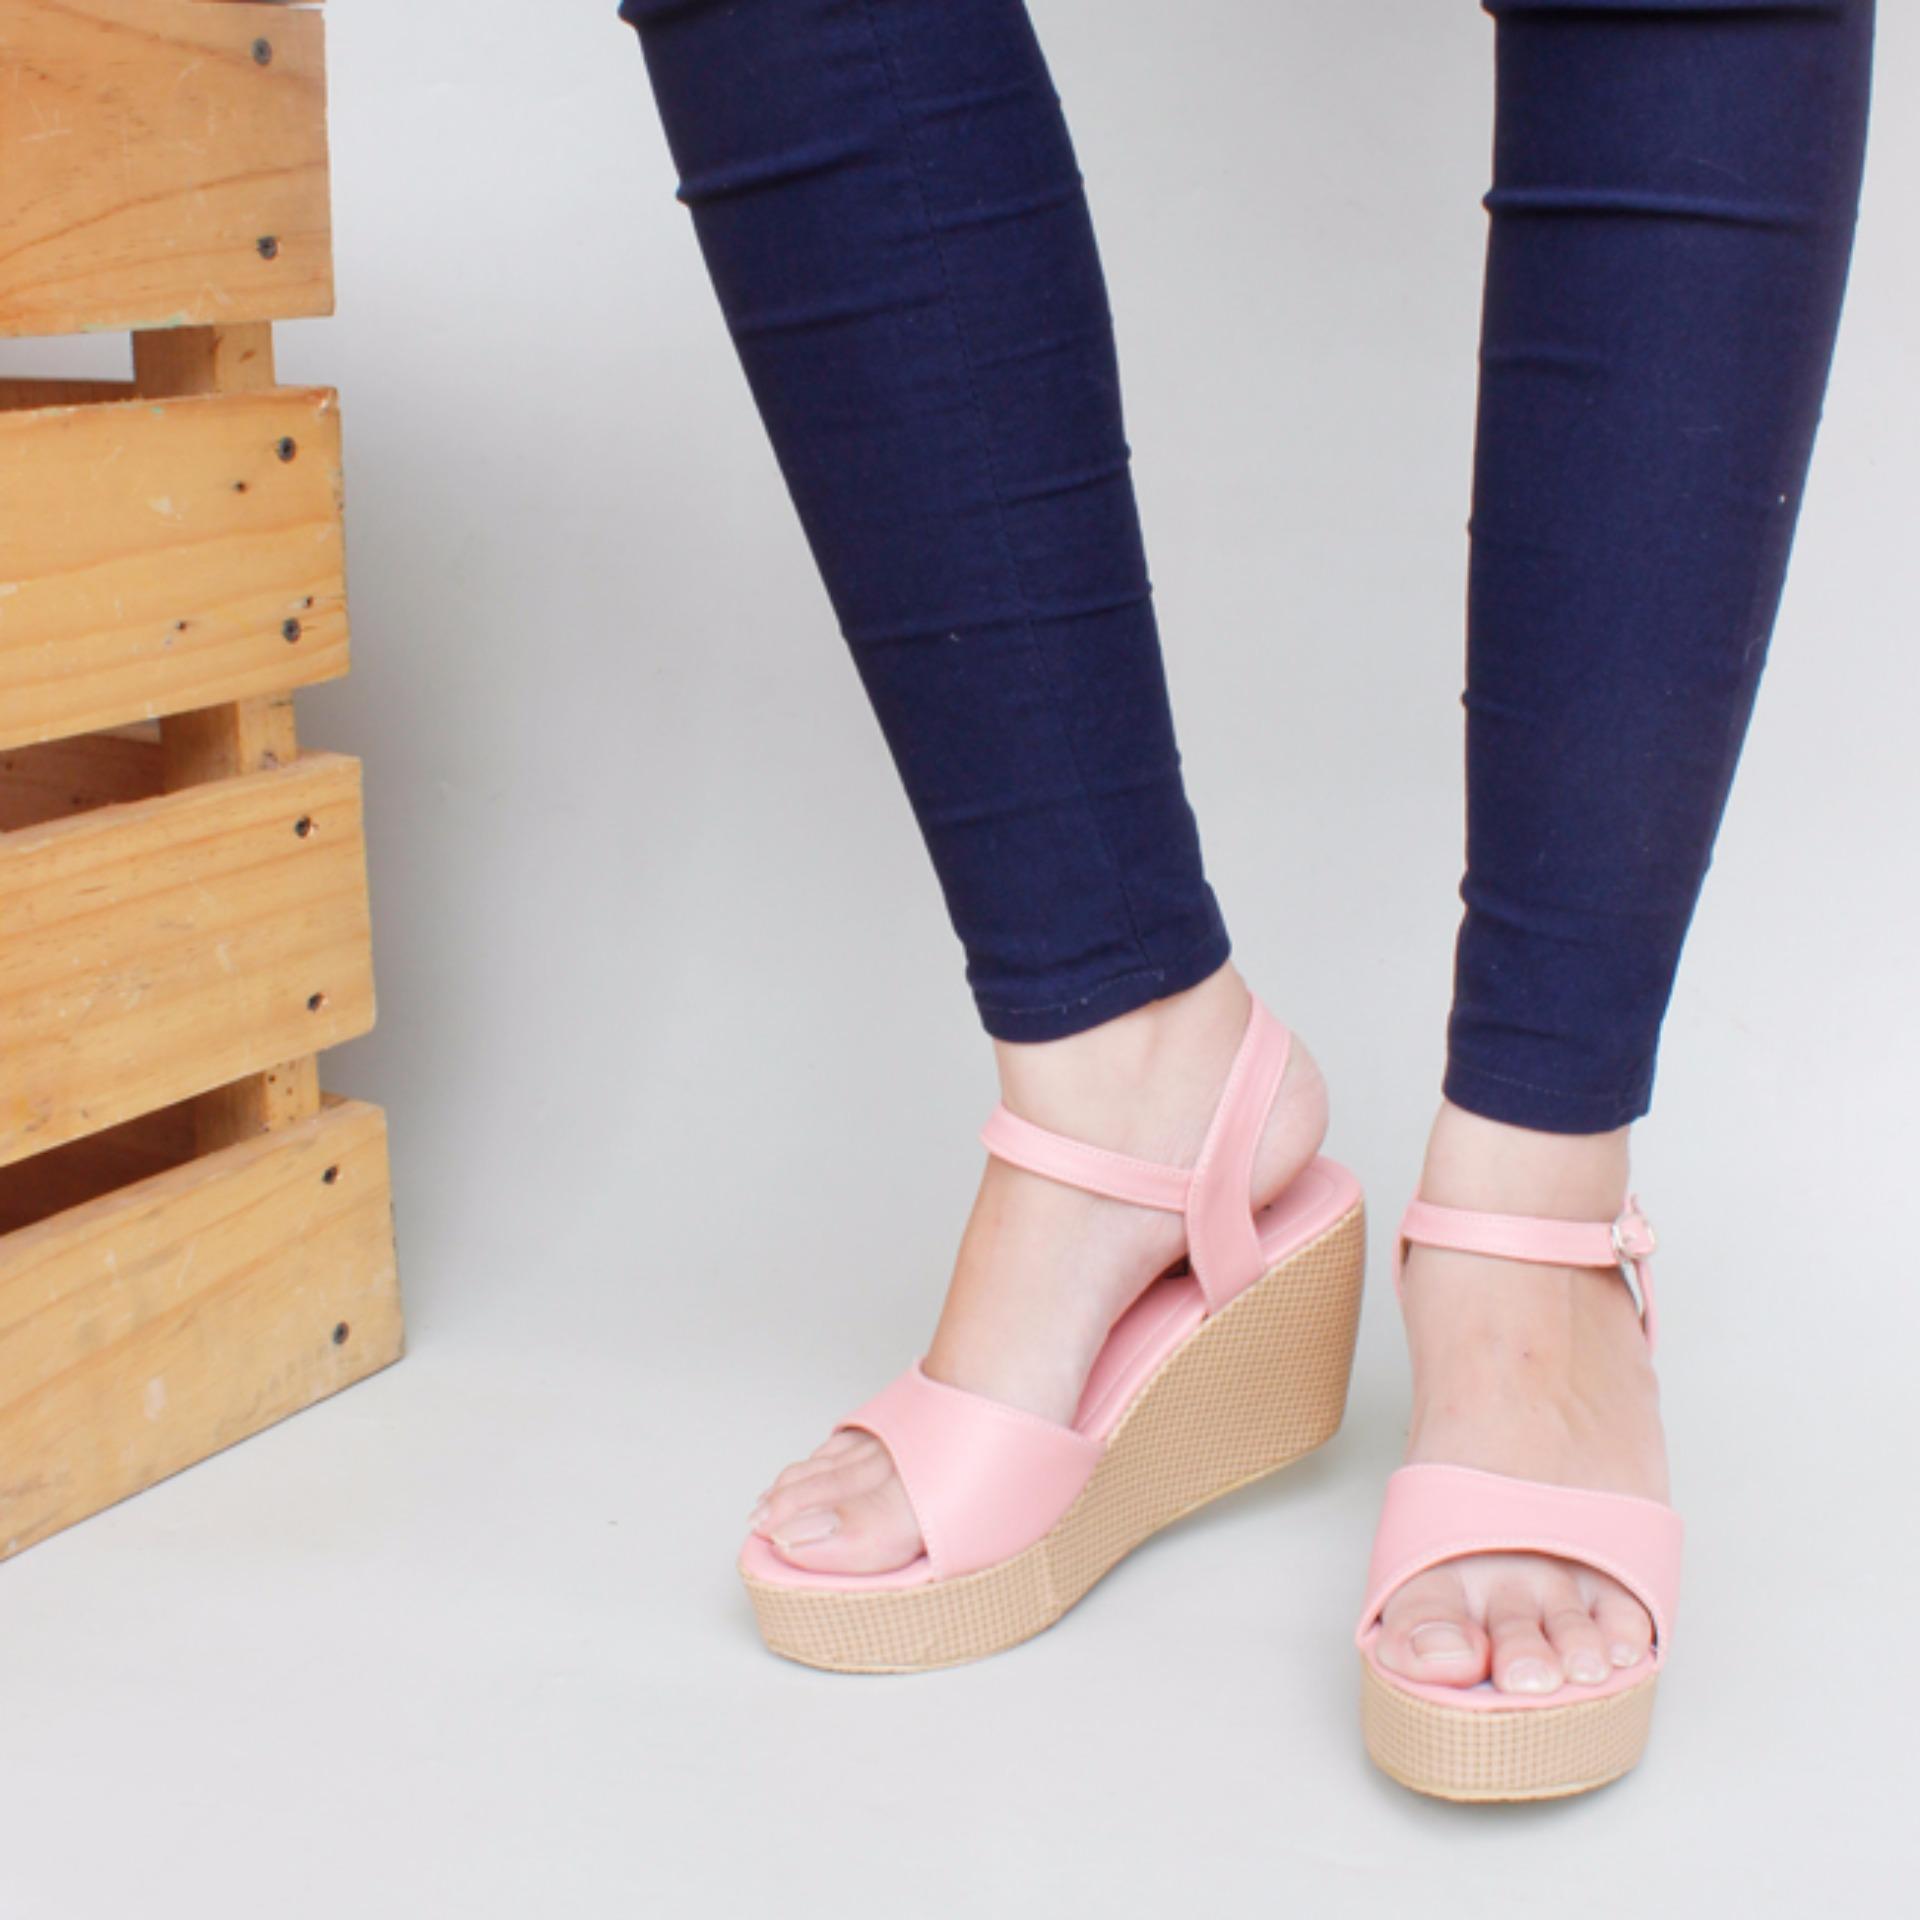 Moya Sepatu Wanita Wedges Ankle Strap CY07 - Salem ...